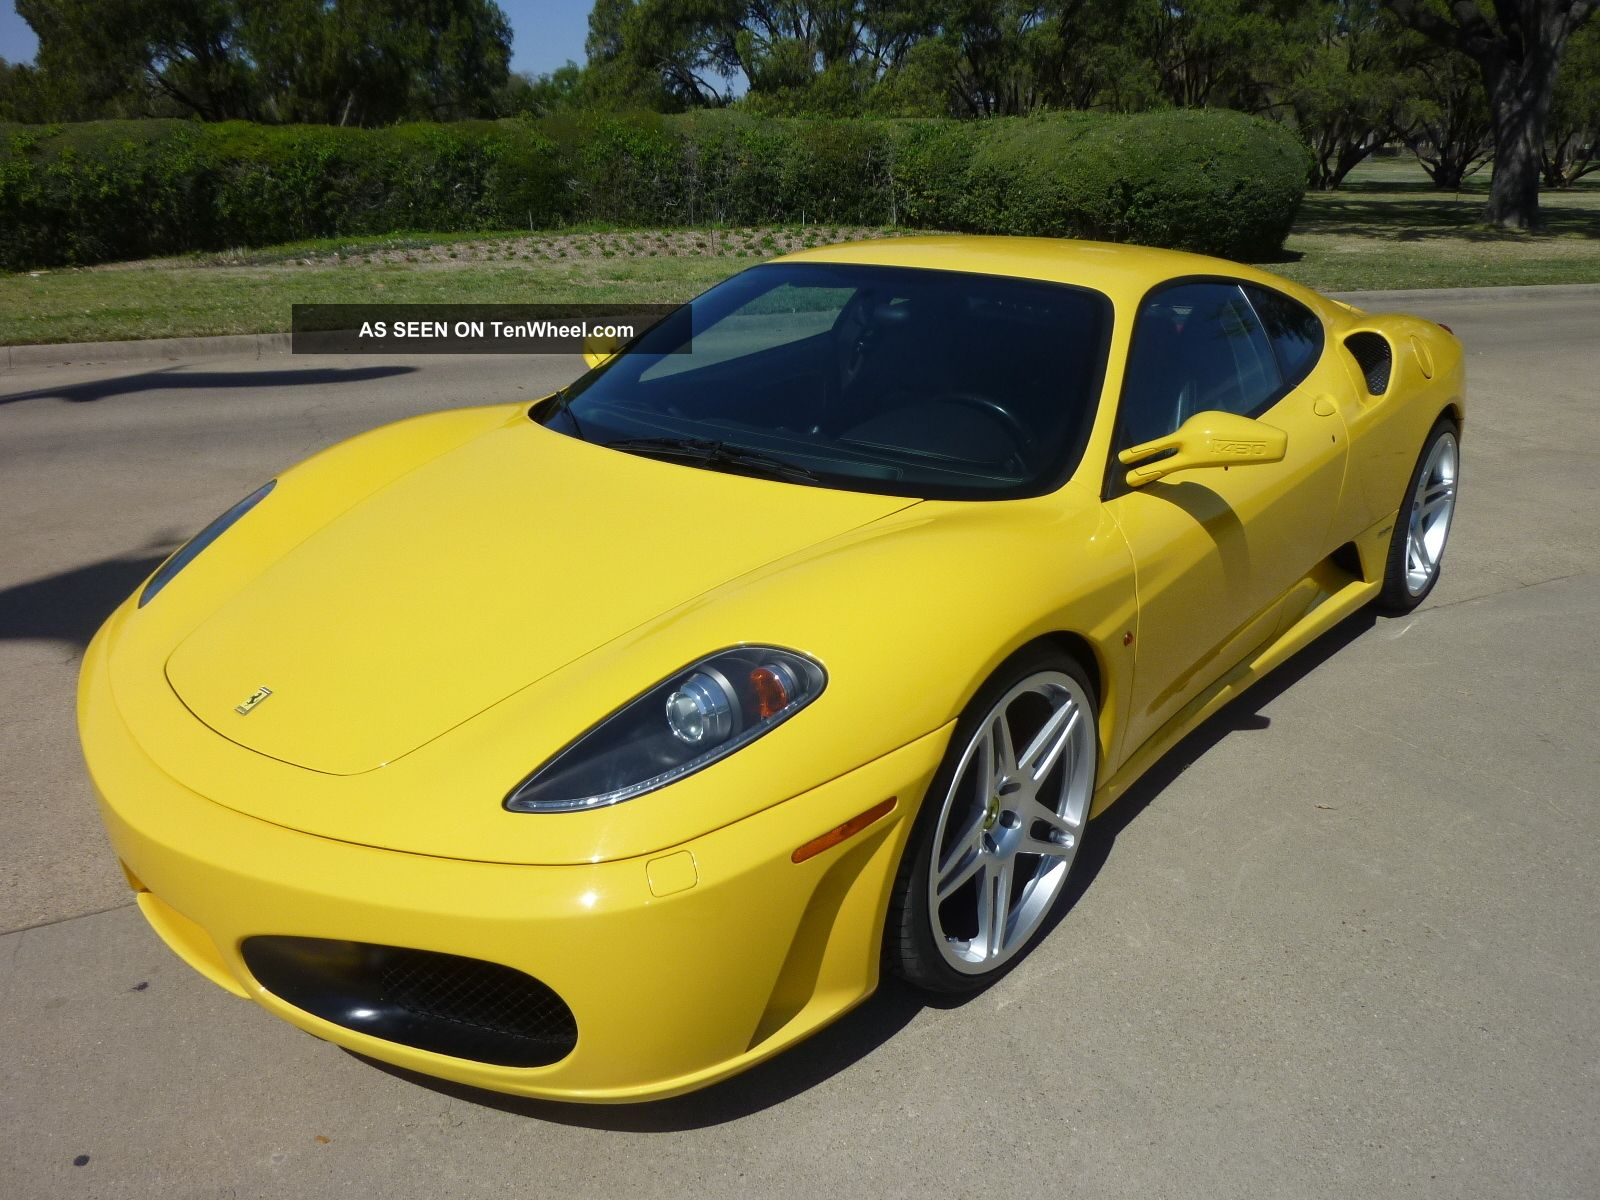 2005 Ferrari F430 Yellow Black 42k Excellent Tires Serviced 430 photo